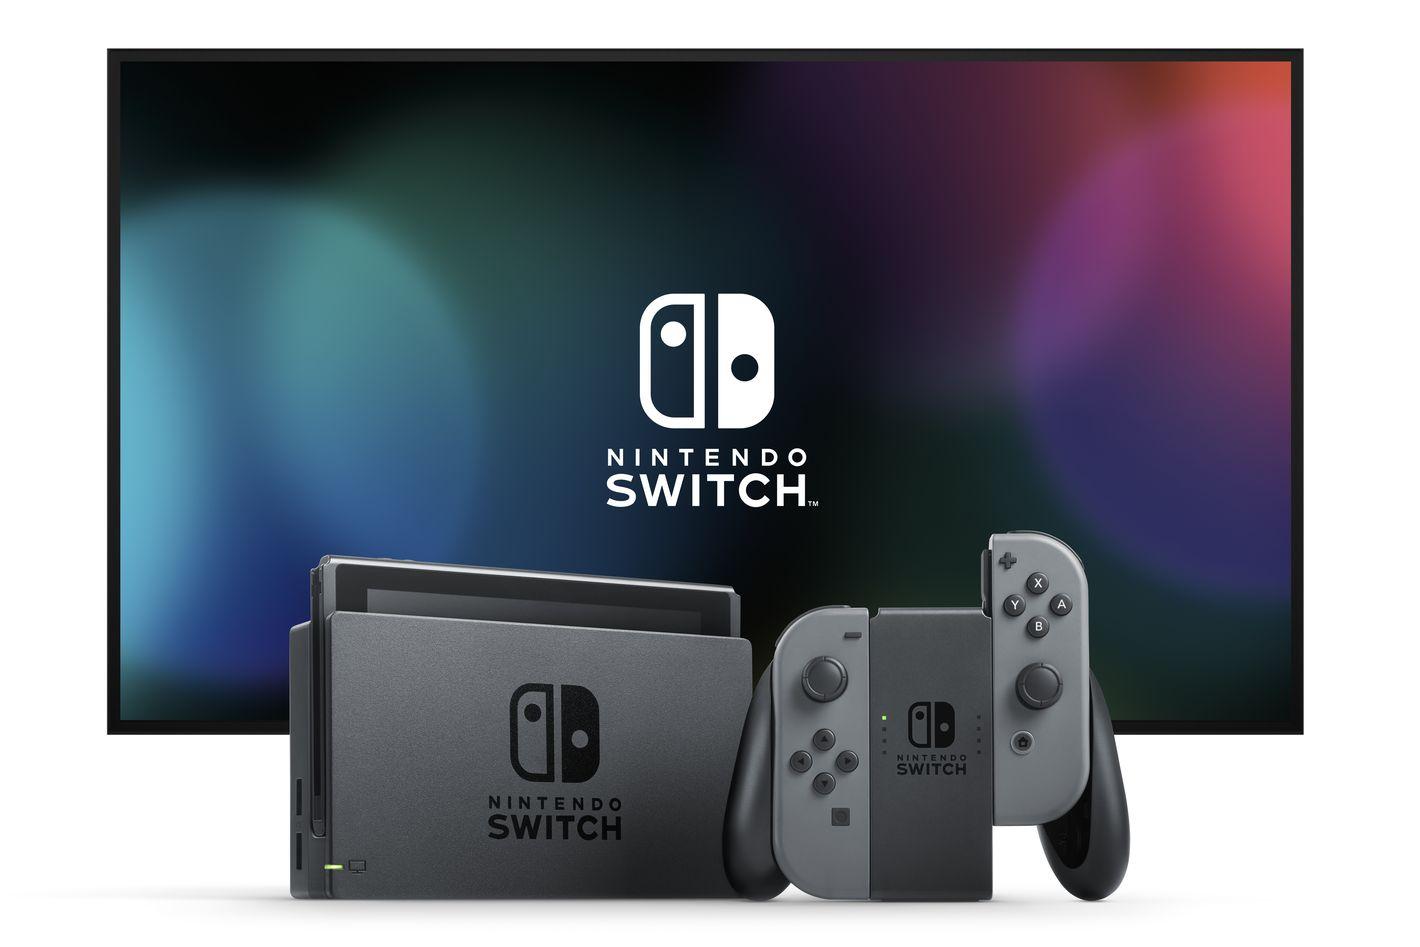 Derfor bør du droppe uoriginal Switch-dokk